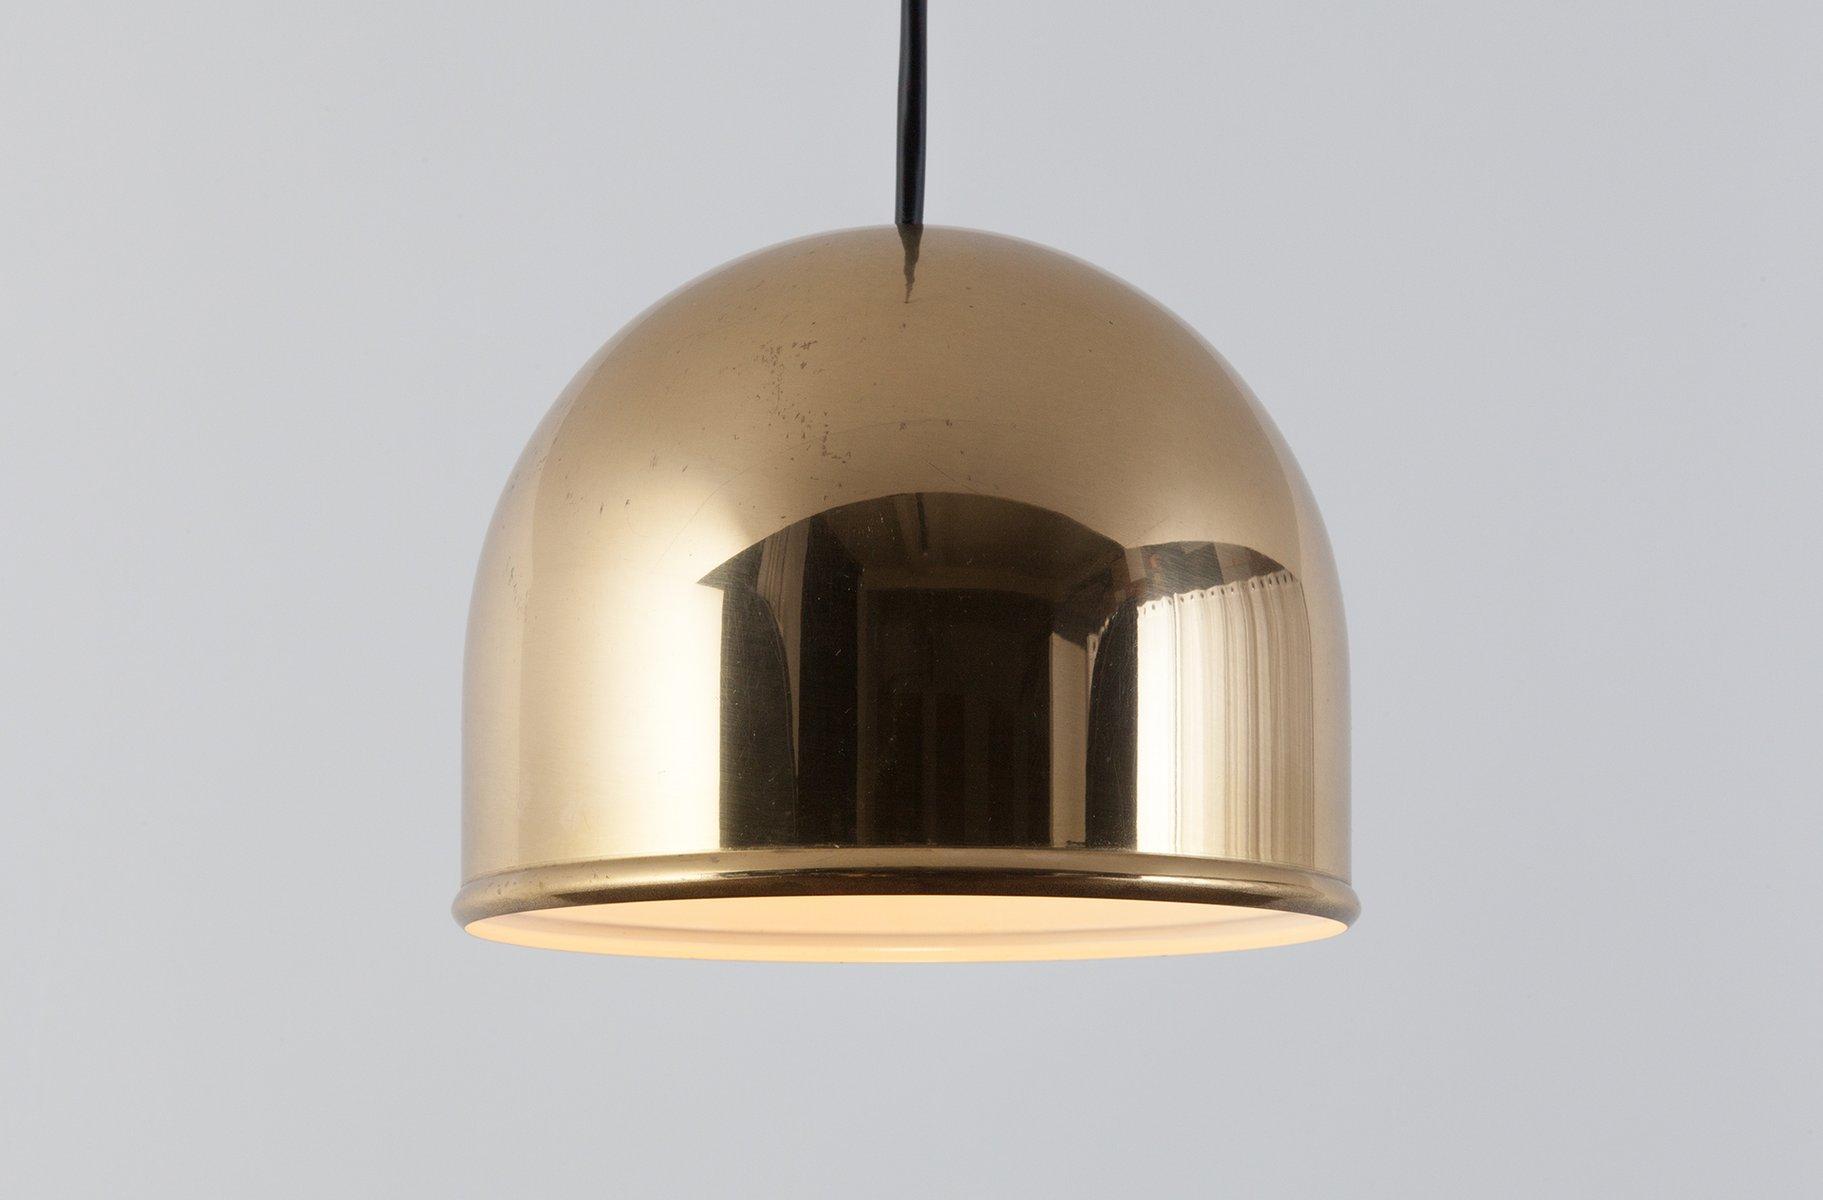 lampe suspension dor e vintage en vente sur pamono. Black Bedroom Furniture Sets. Home Design Ideas